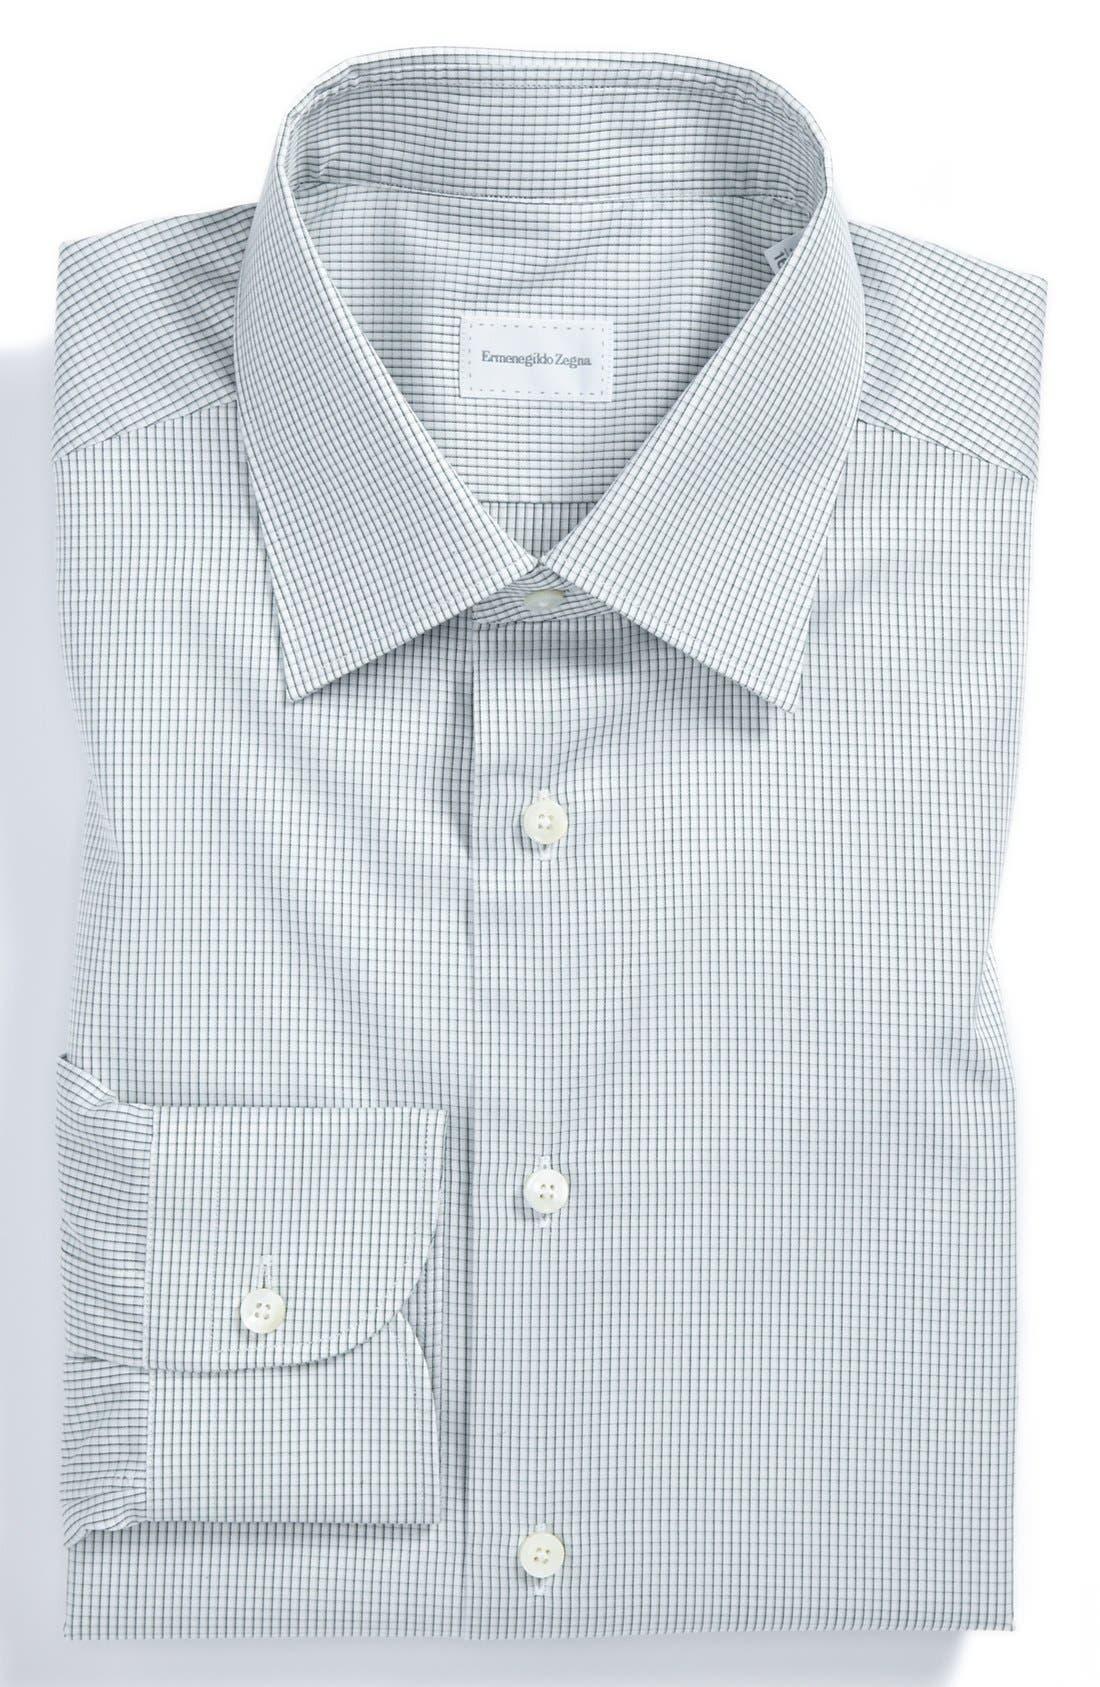 Regular Fit Dress Shirt,                             Main thumbnail 1, color,                             Green